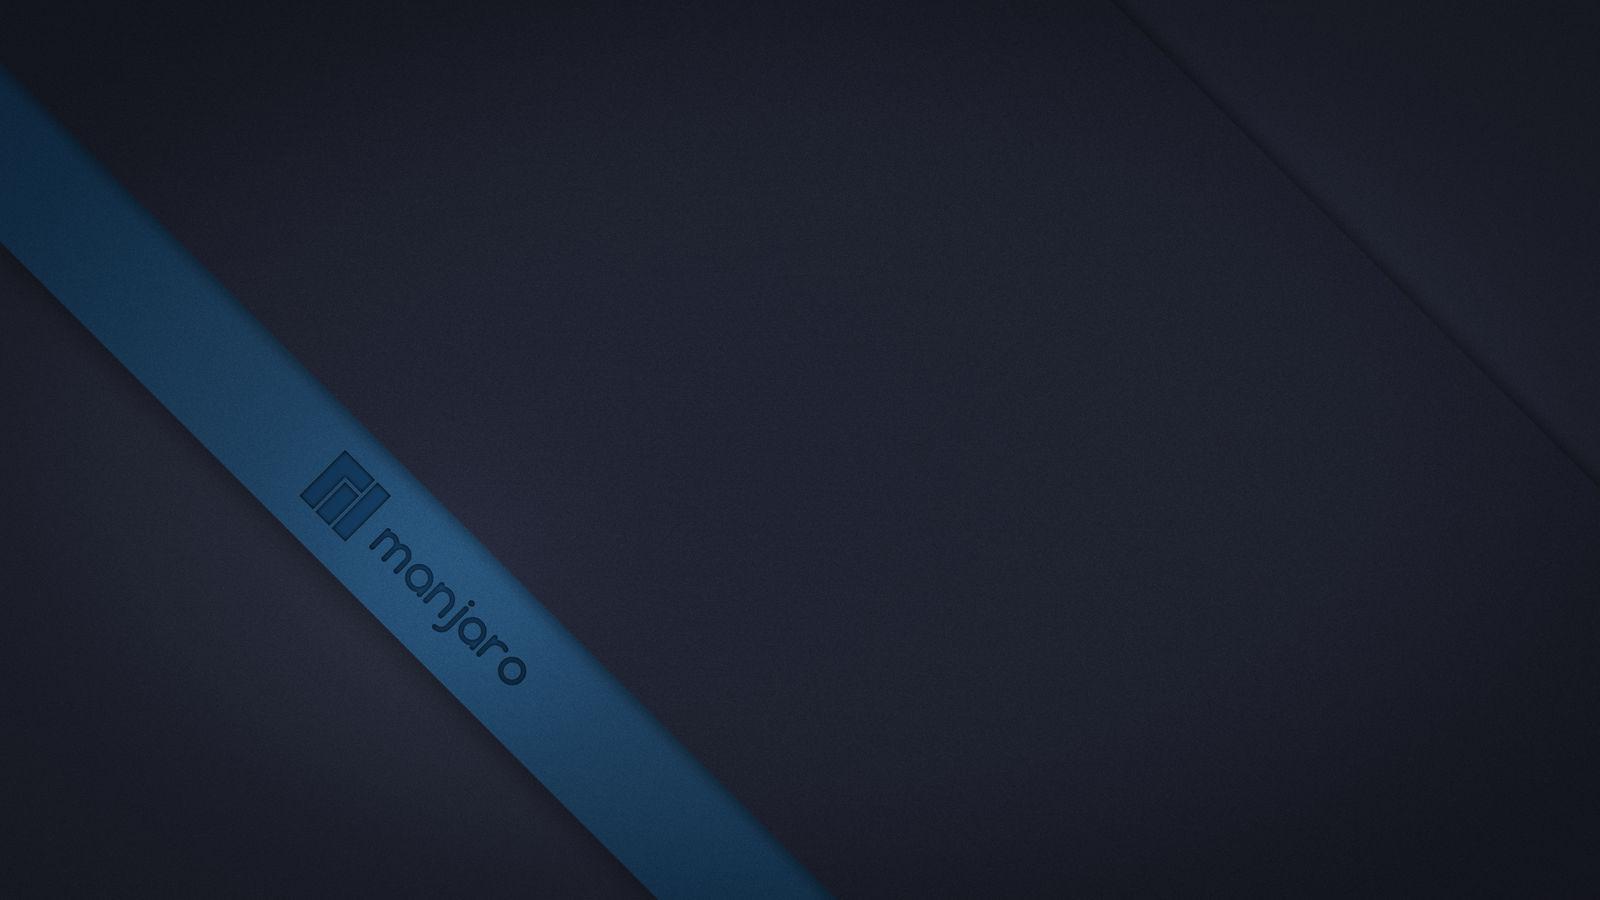 Manjaro material blue 4k